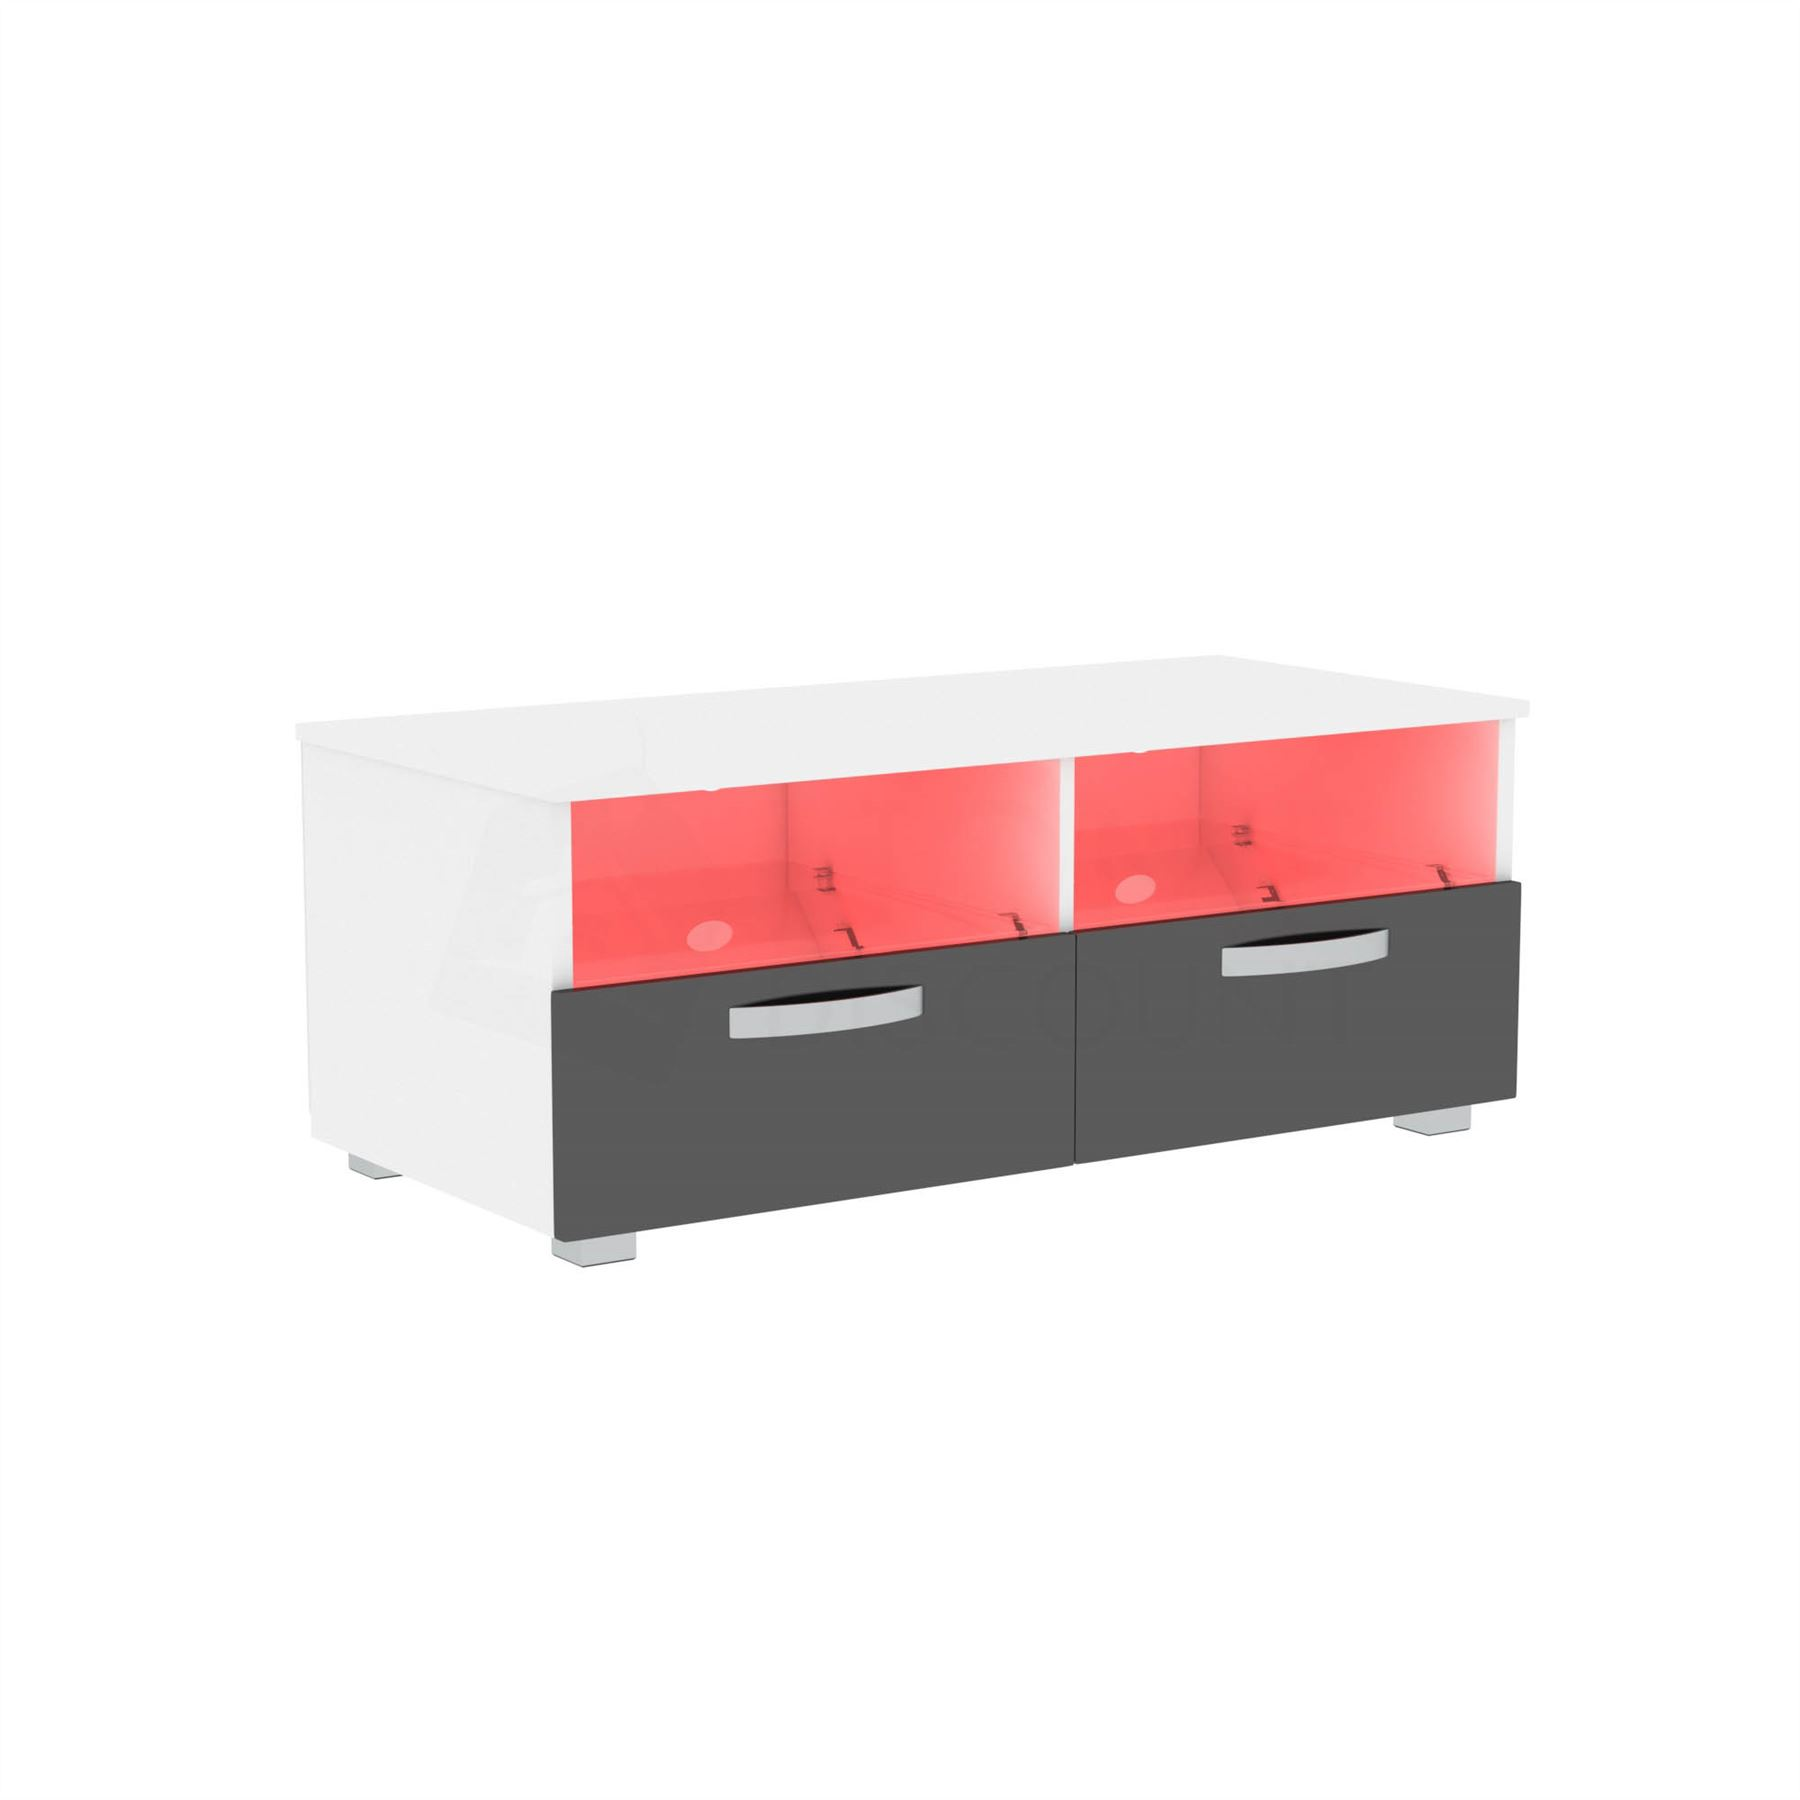 thumbnail 76 - Modern White TV Unit Cabinet Stand Matt body and High Gloss Doors LED Lights